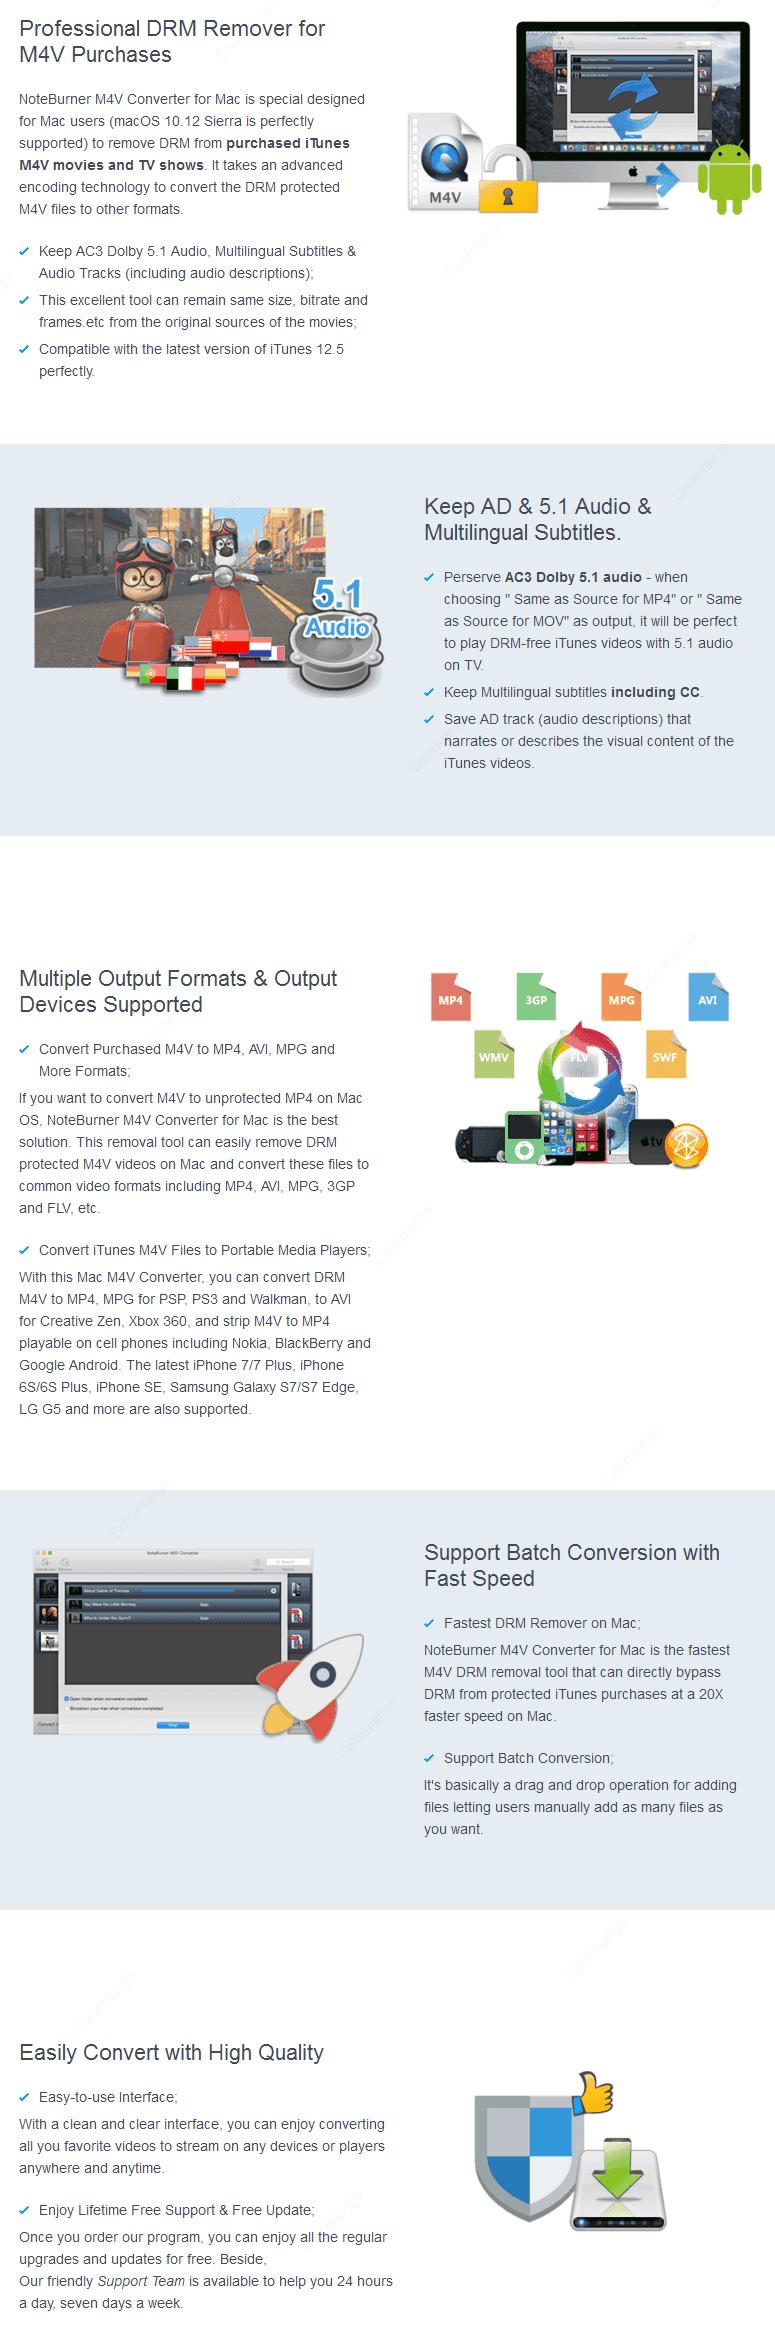 NoteBurner M4V Converter 10% Discount